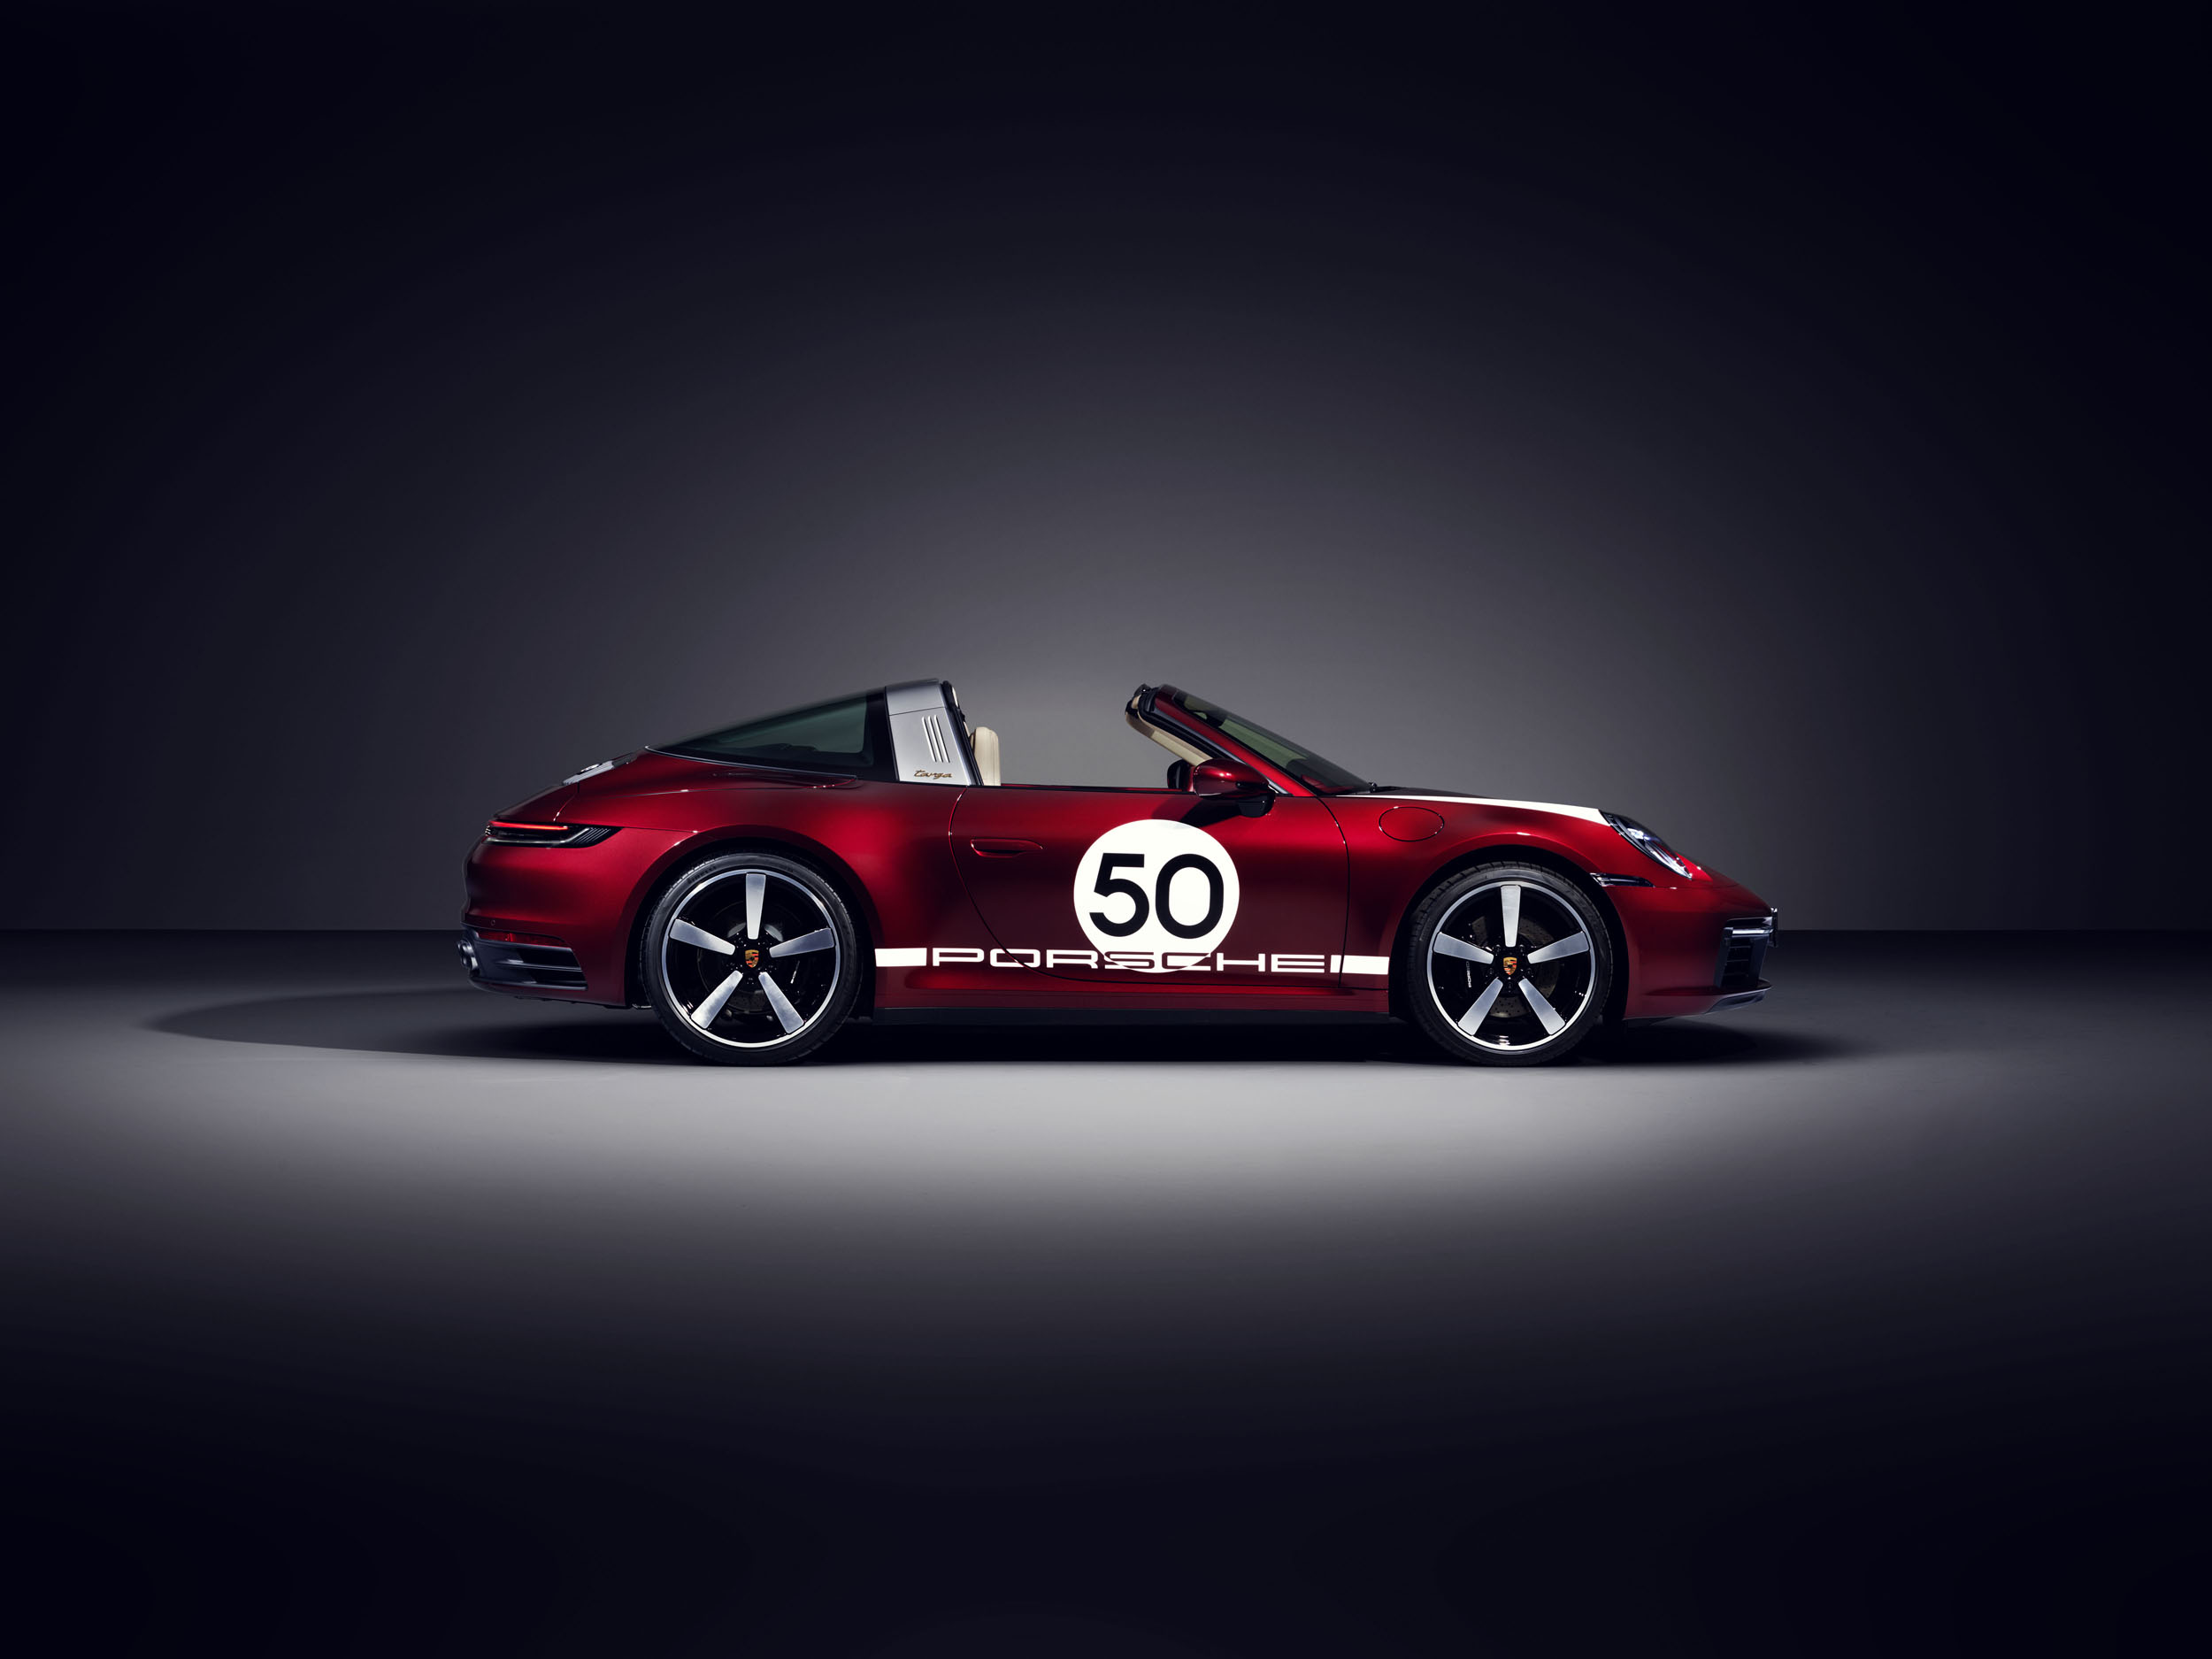 Porsche 911 Targa 4S Heritage Design Edition, profile